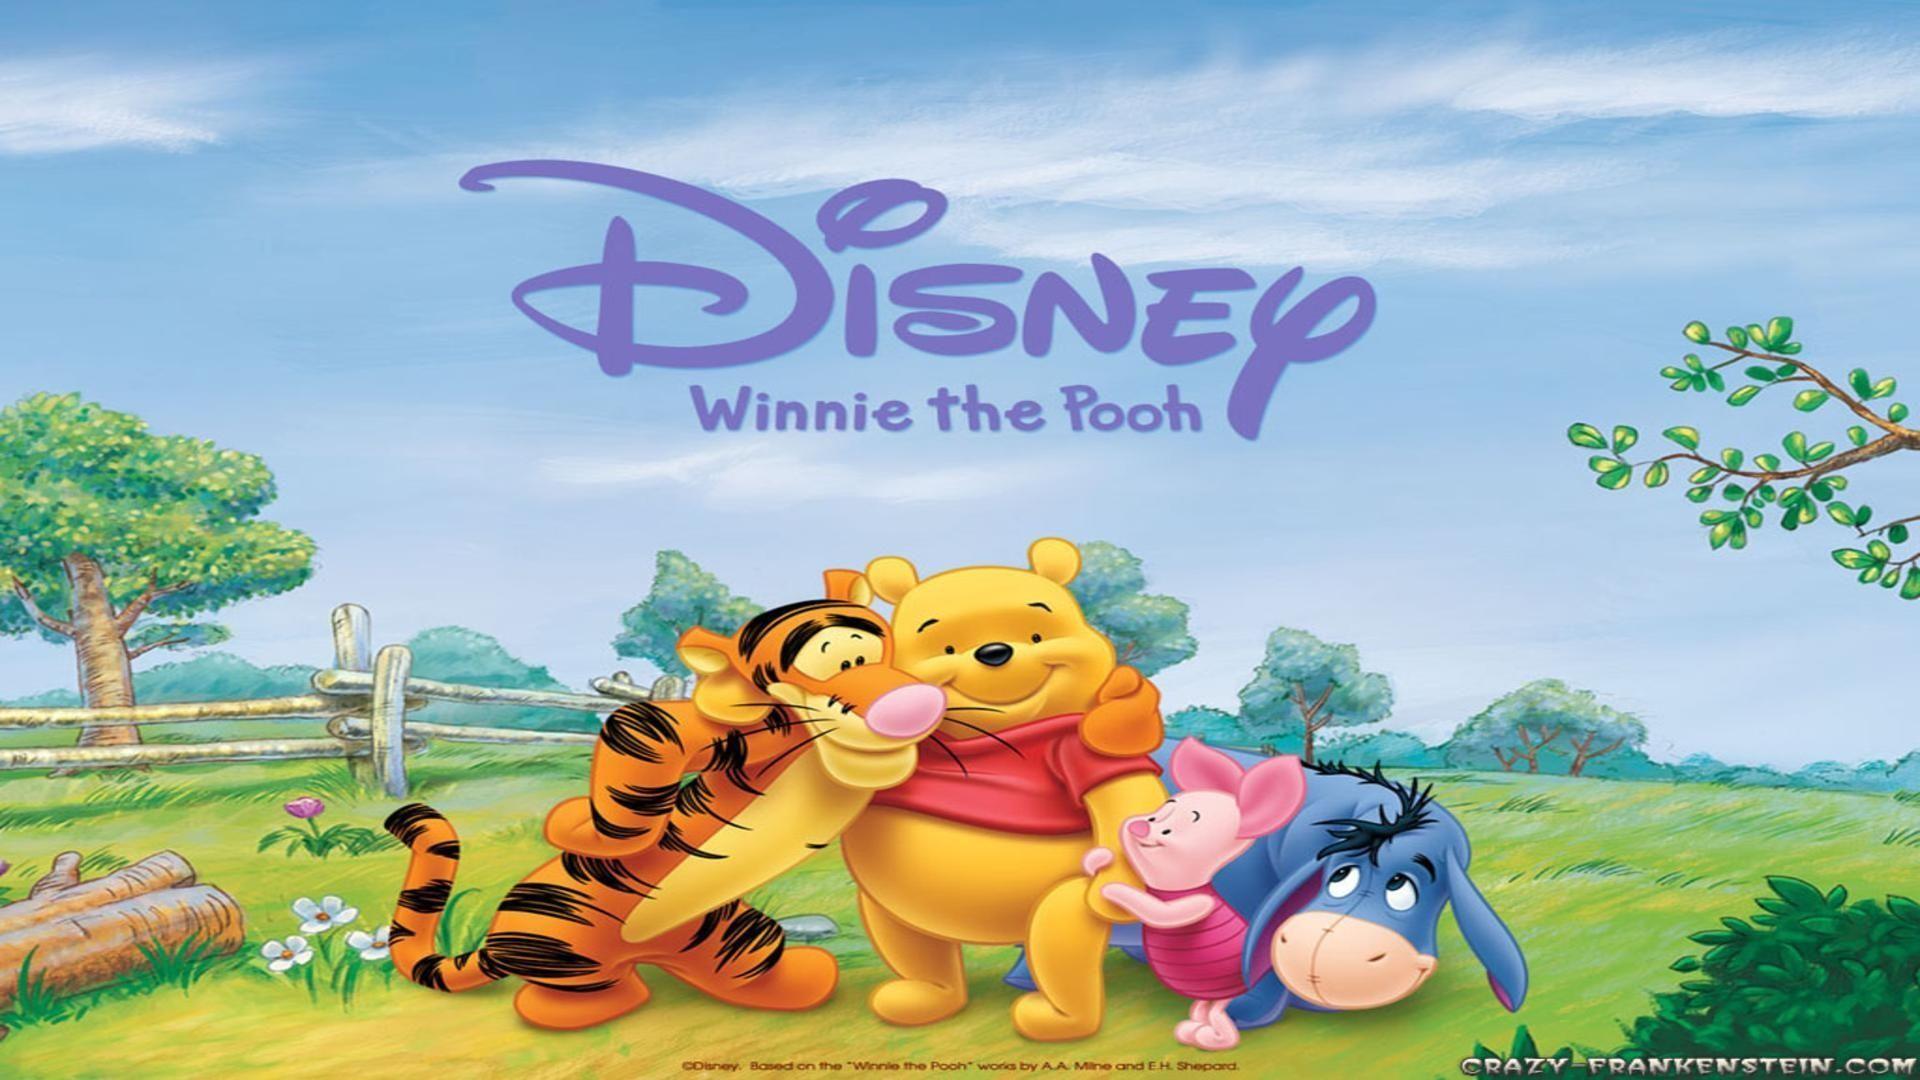 Winnie the pooh easter wallpaper 64 images 2480x1795 winnie pooh desktop background winnie the modifikasi sepeda motor download voltagebd Images